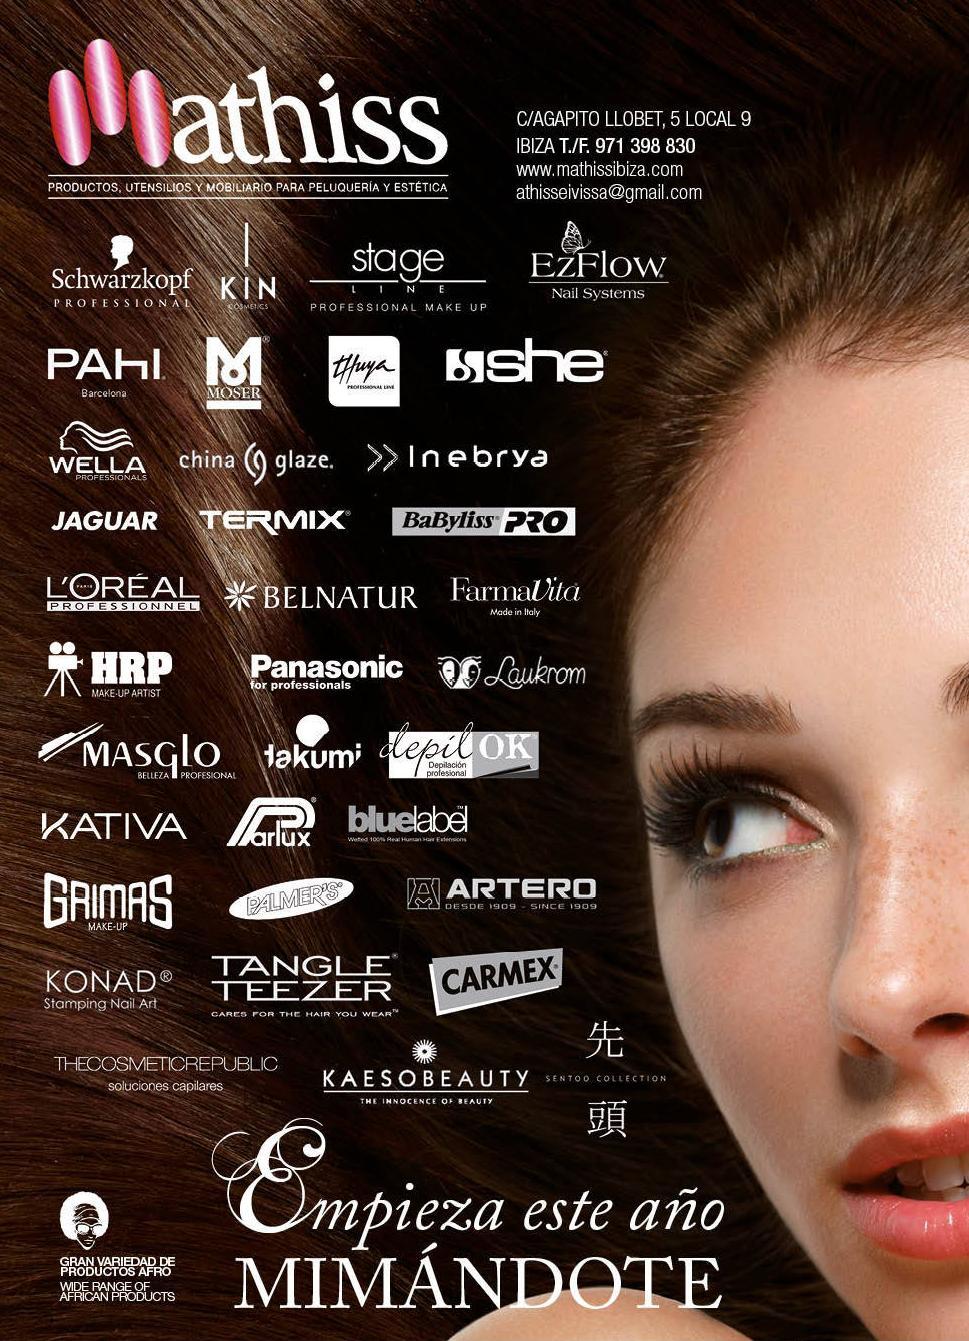 Picture 30 of Suministros para peluquerías y estética  in Ibiza | Mathiss